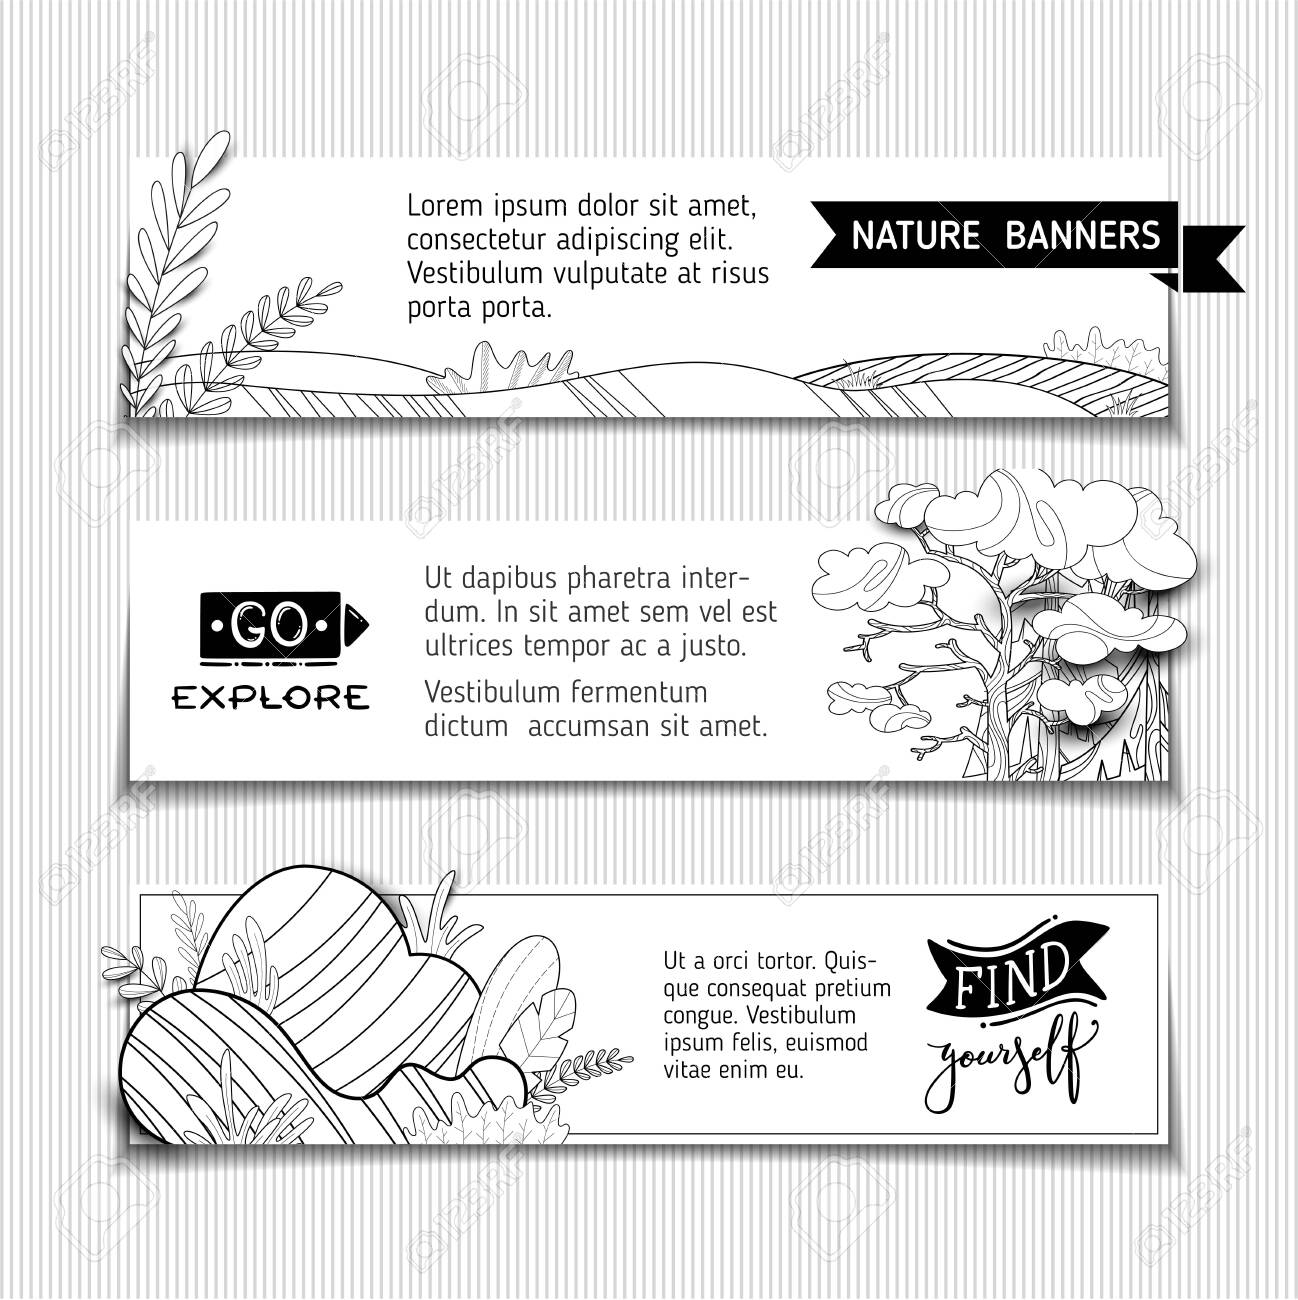 Nature landscapes  Doodles pine, fir, stones and fields  Copy